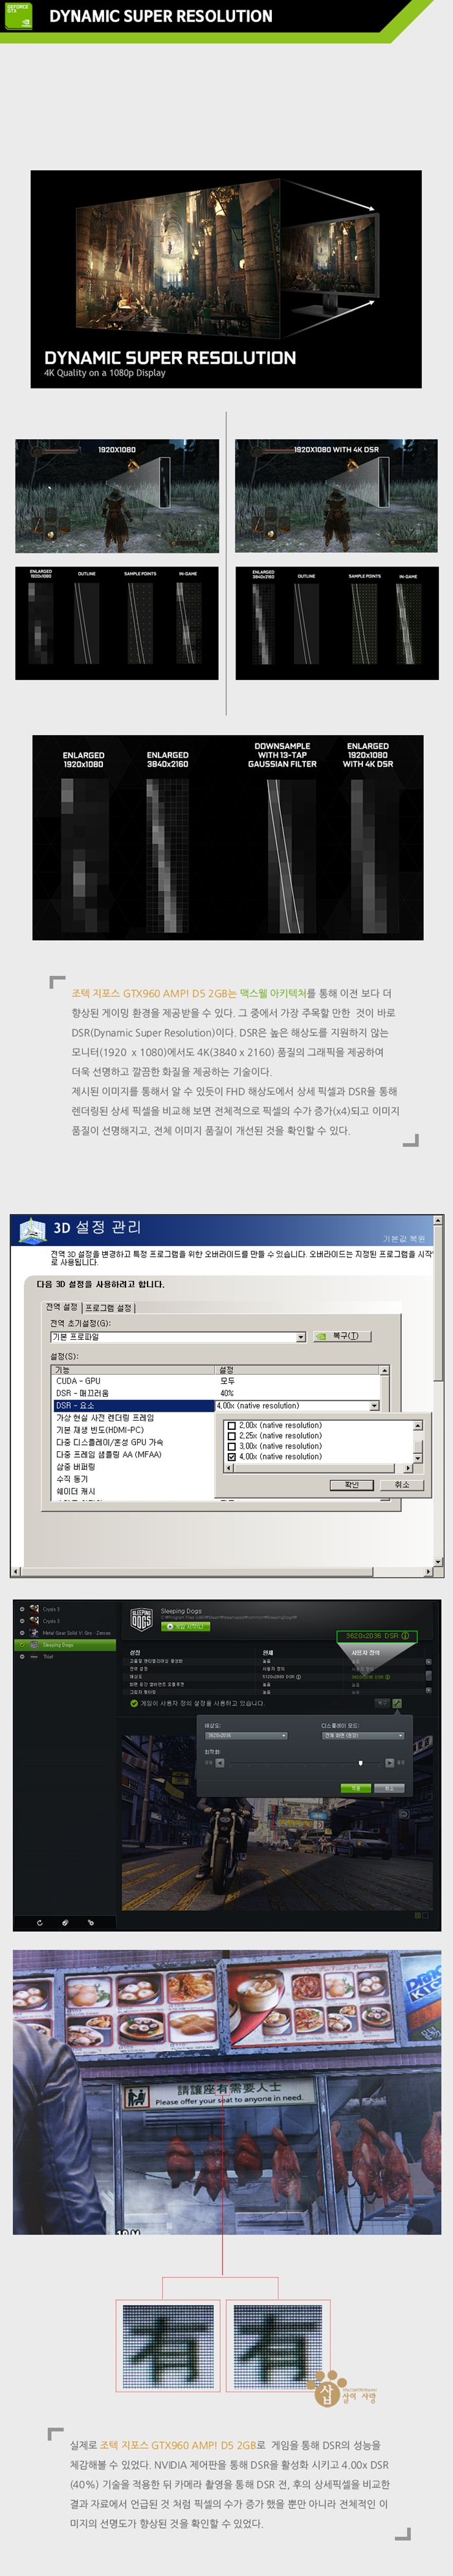 GTX960DSR 조텍 지포스 GTX960 AMP! 아이스스톰 D5 2GB.jpg